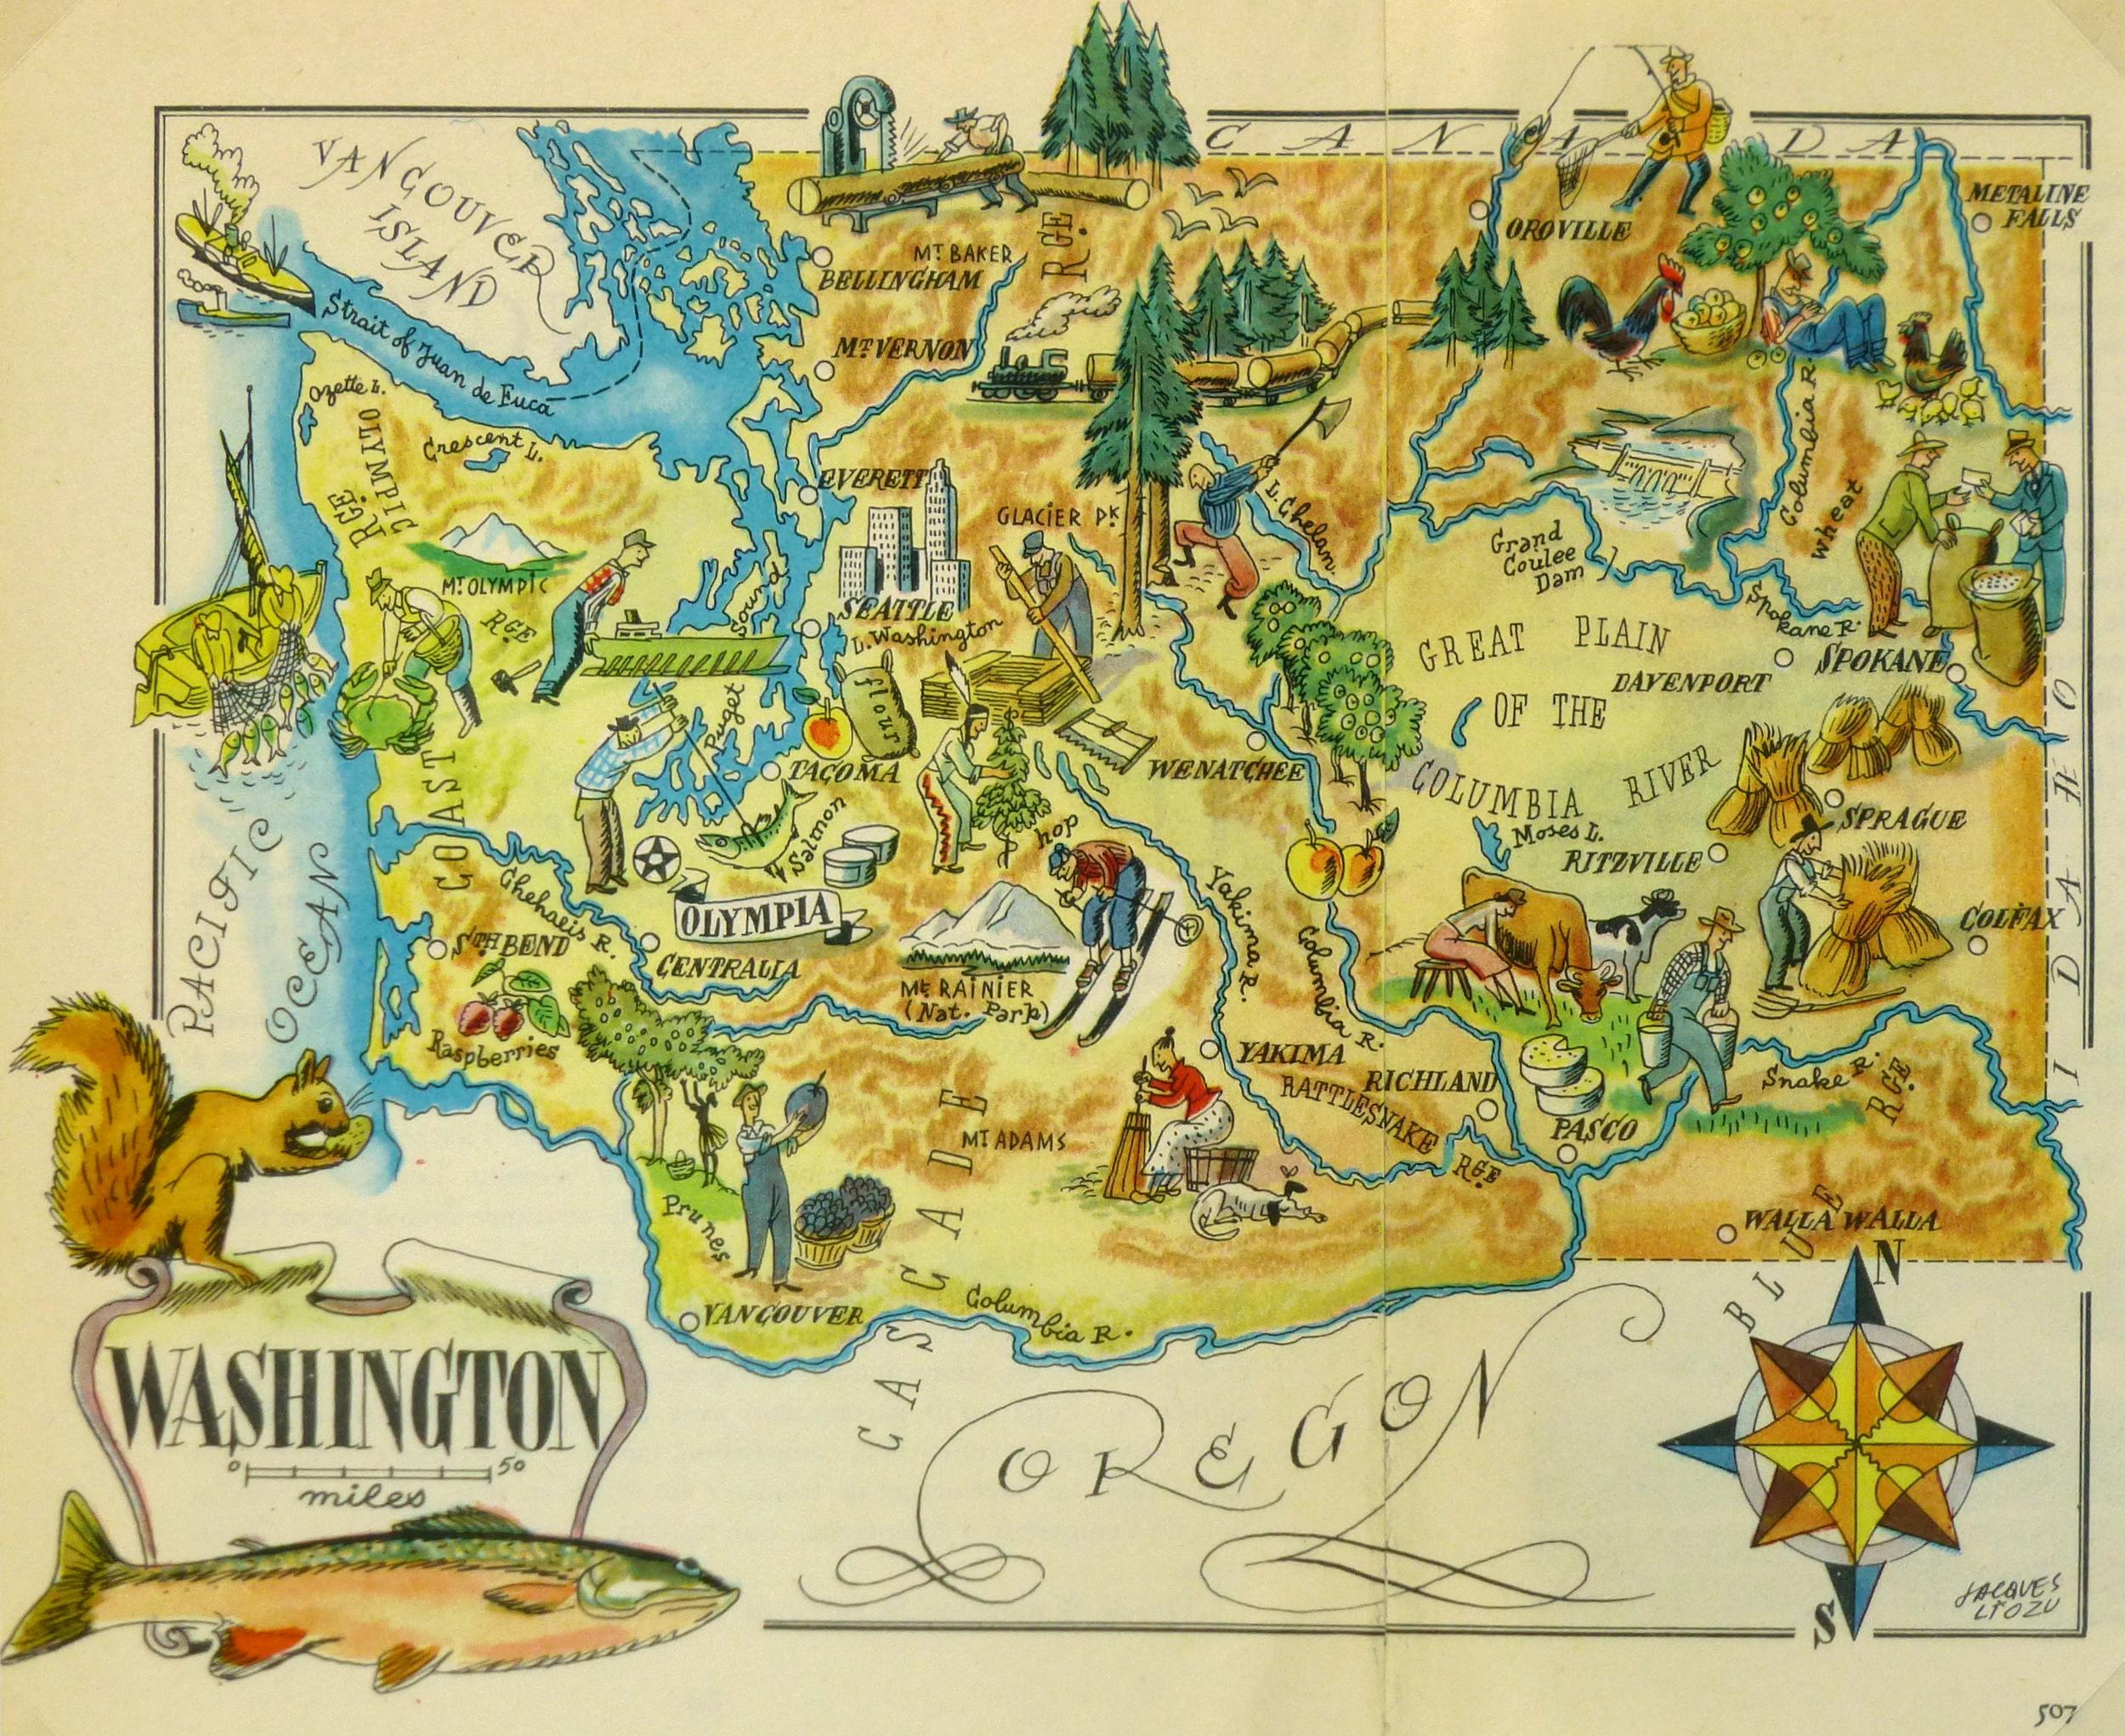 Washington Pictorial Map, 1946-main-6260K